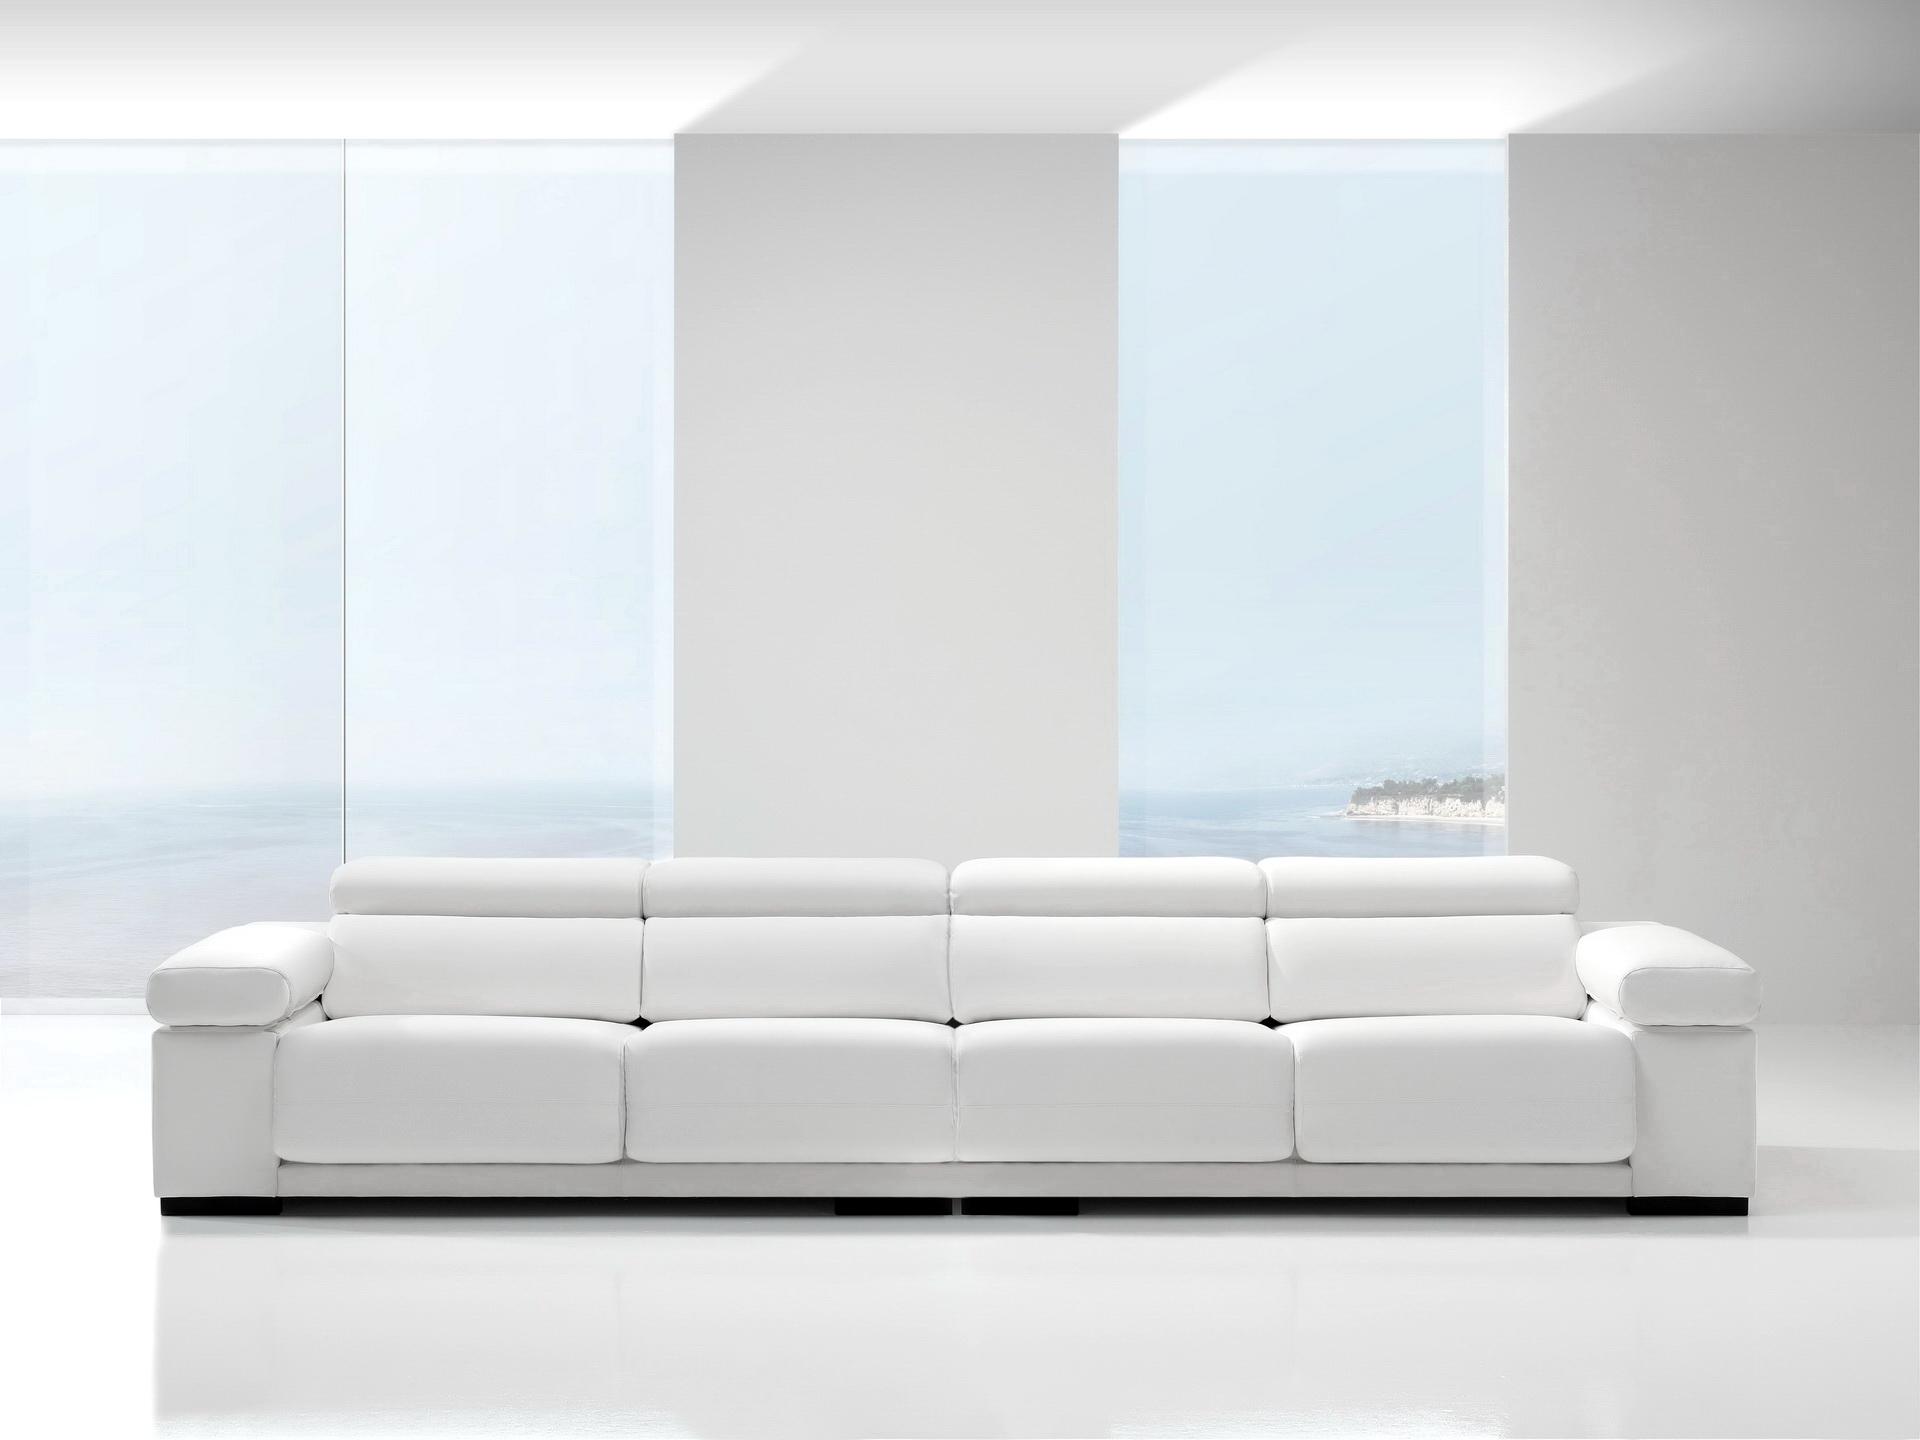 SOFA CHAISE LONGUE by WIO 015A en muebles antoñán® León